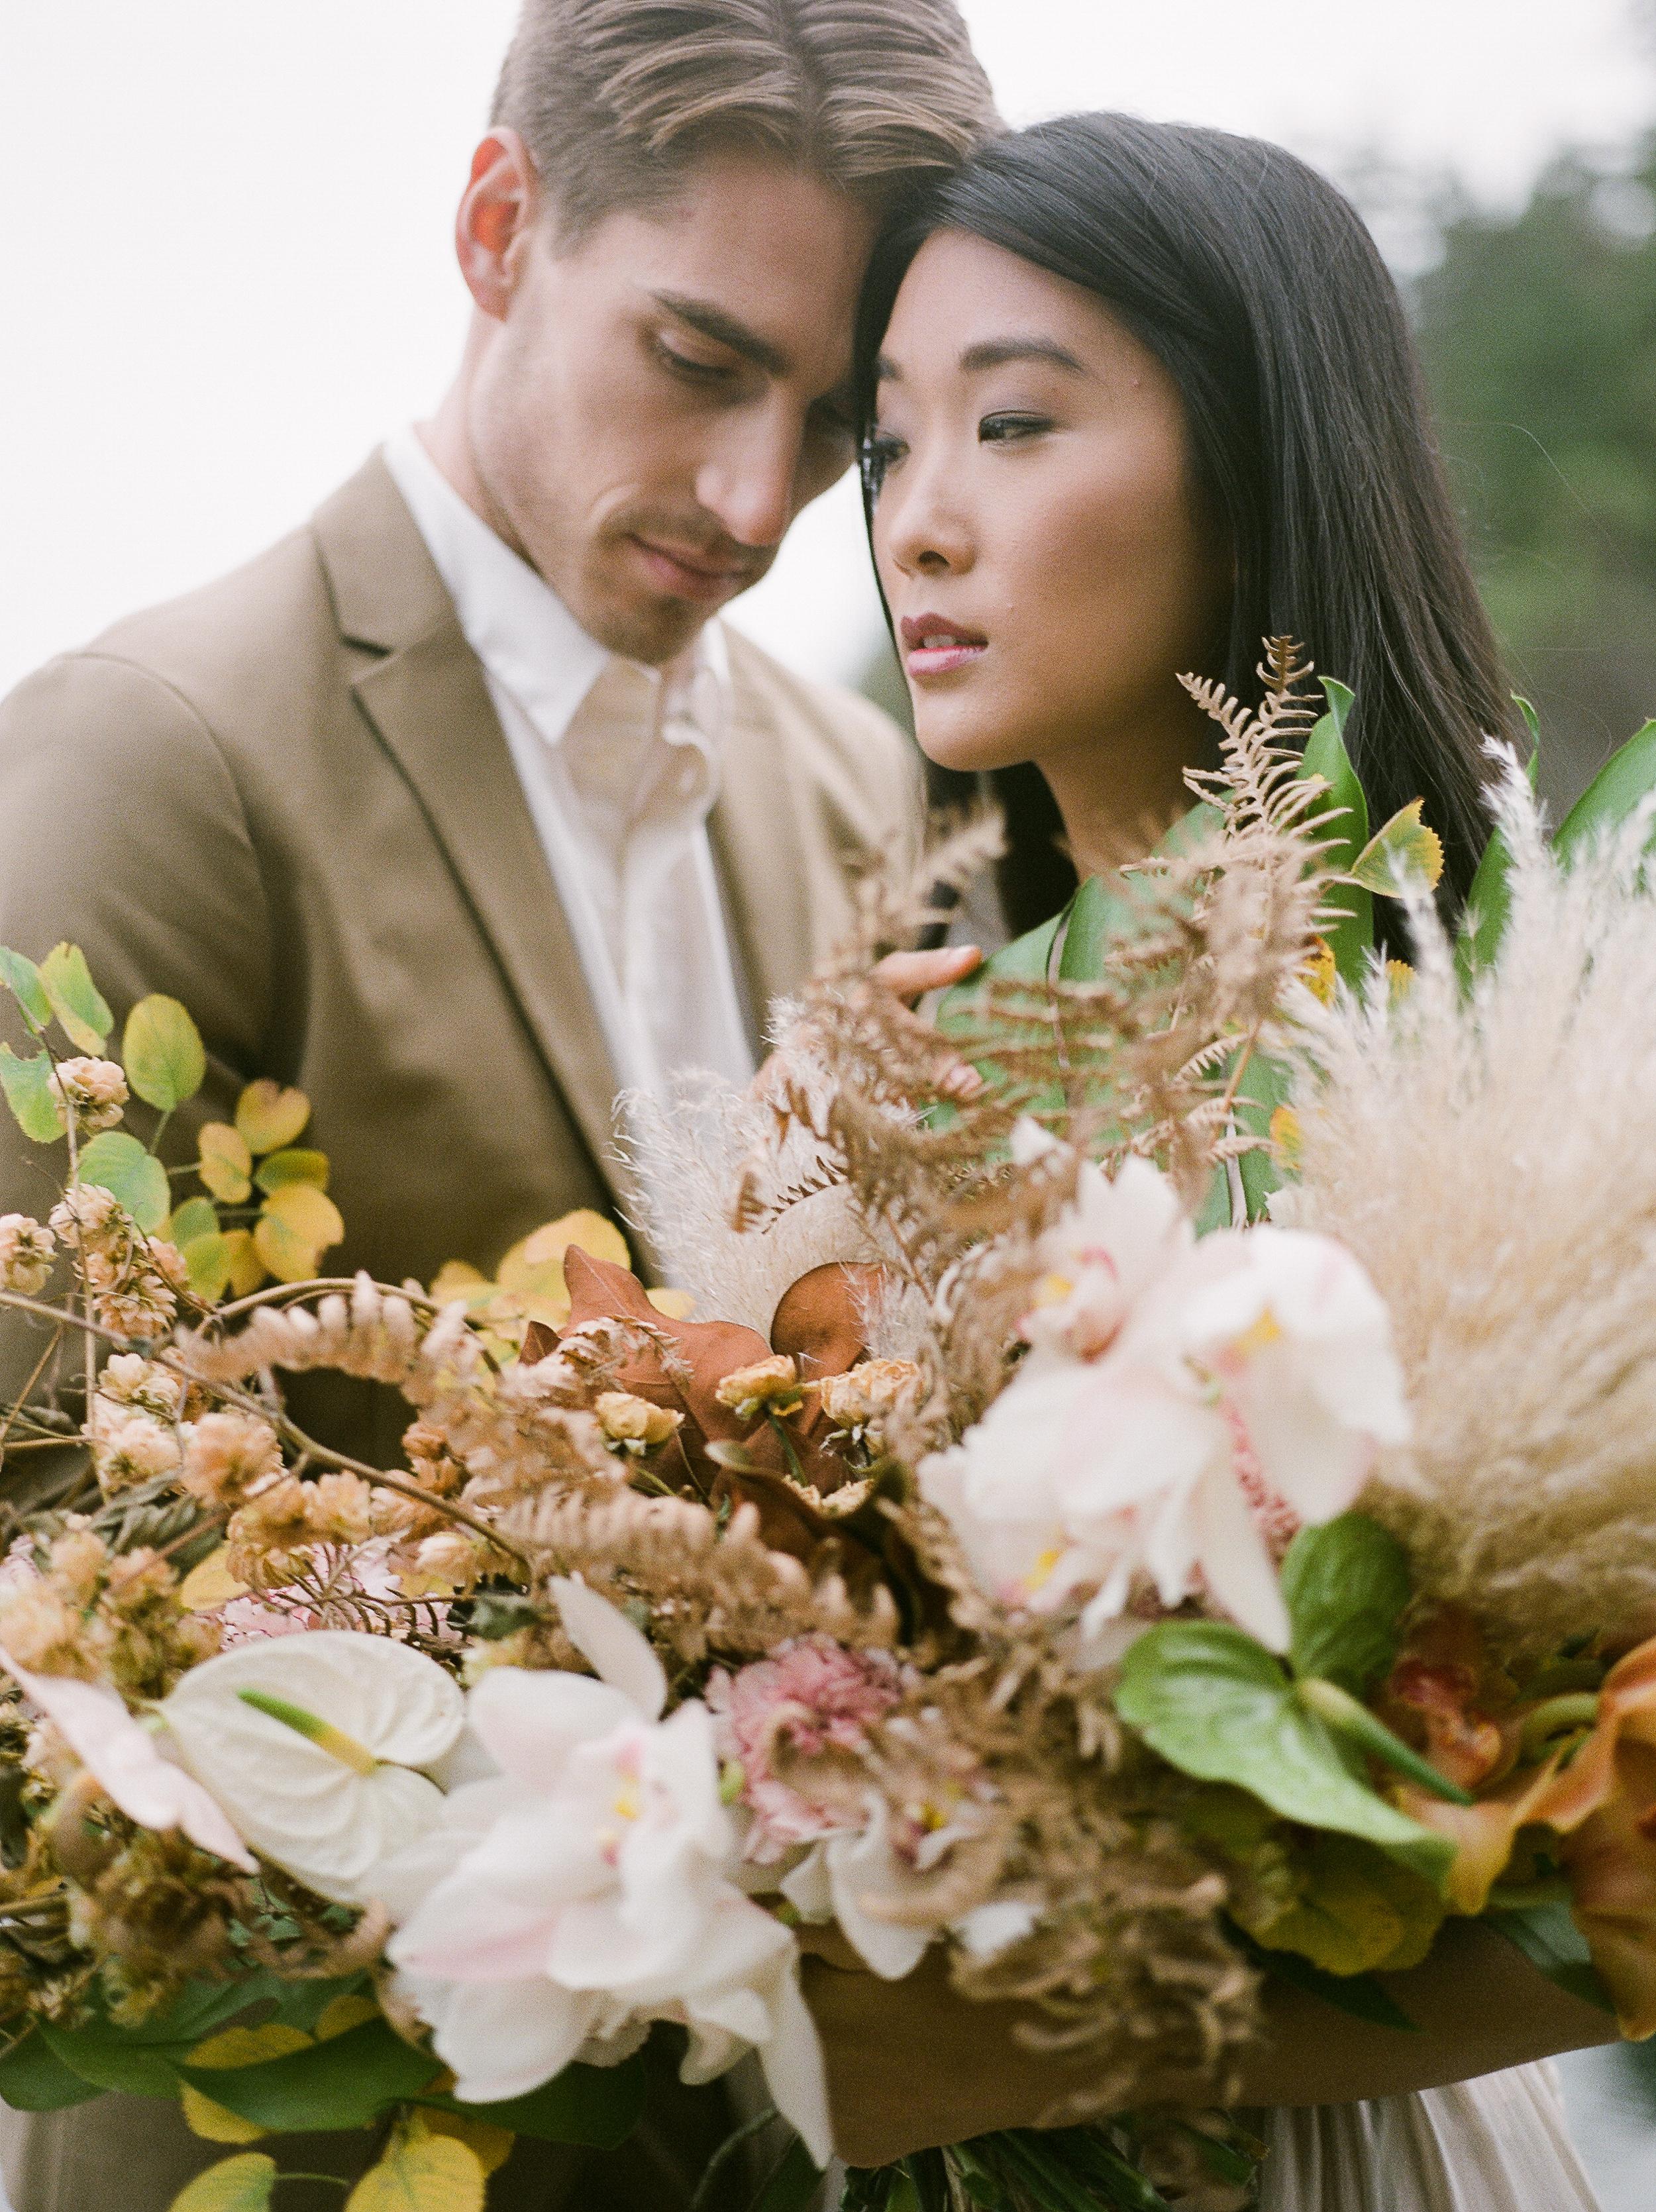 639659e971 Winnipeg Wedding Photographer, Vancouver Wedding Photographer, Ponderosa &  Thyme Bridal Bouquet, Leanne Marshall